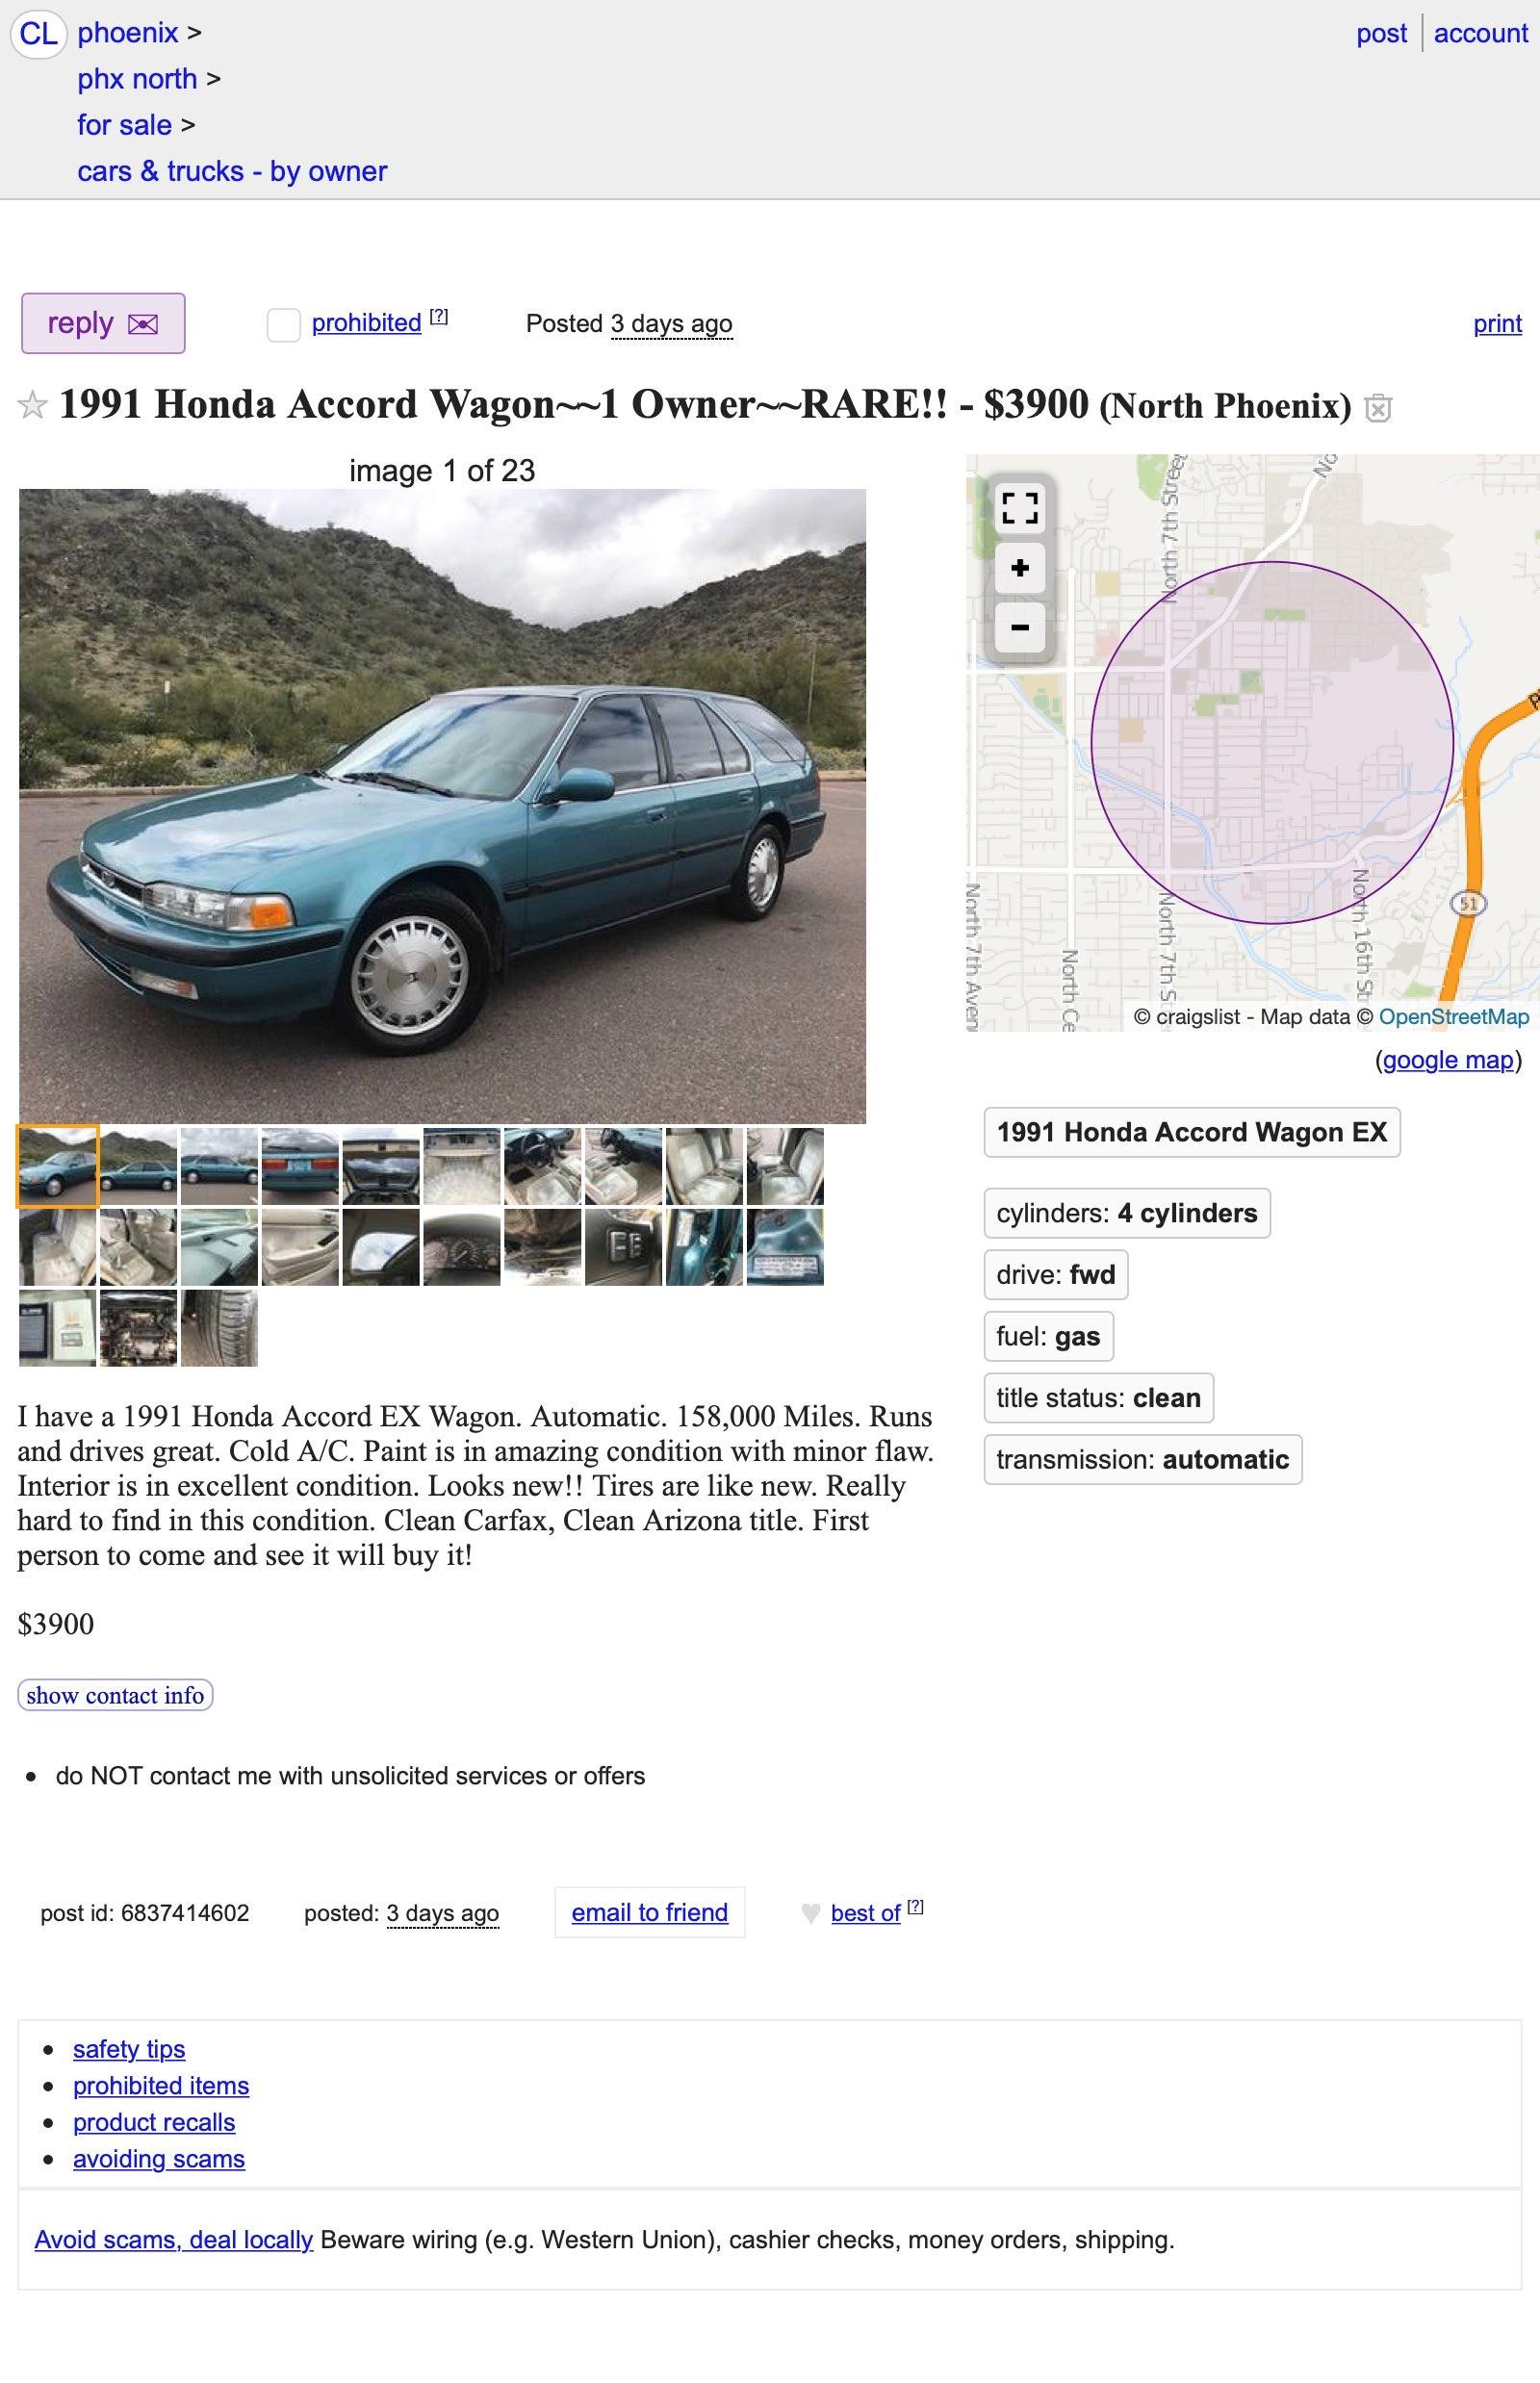 Does its $3,900 Price Make This 1991 Honda Accord EX a Wagon Worth